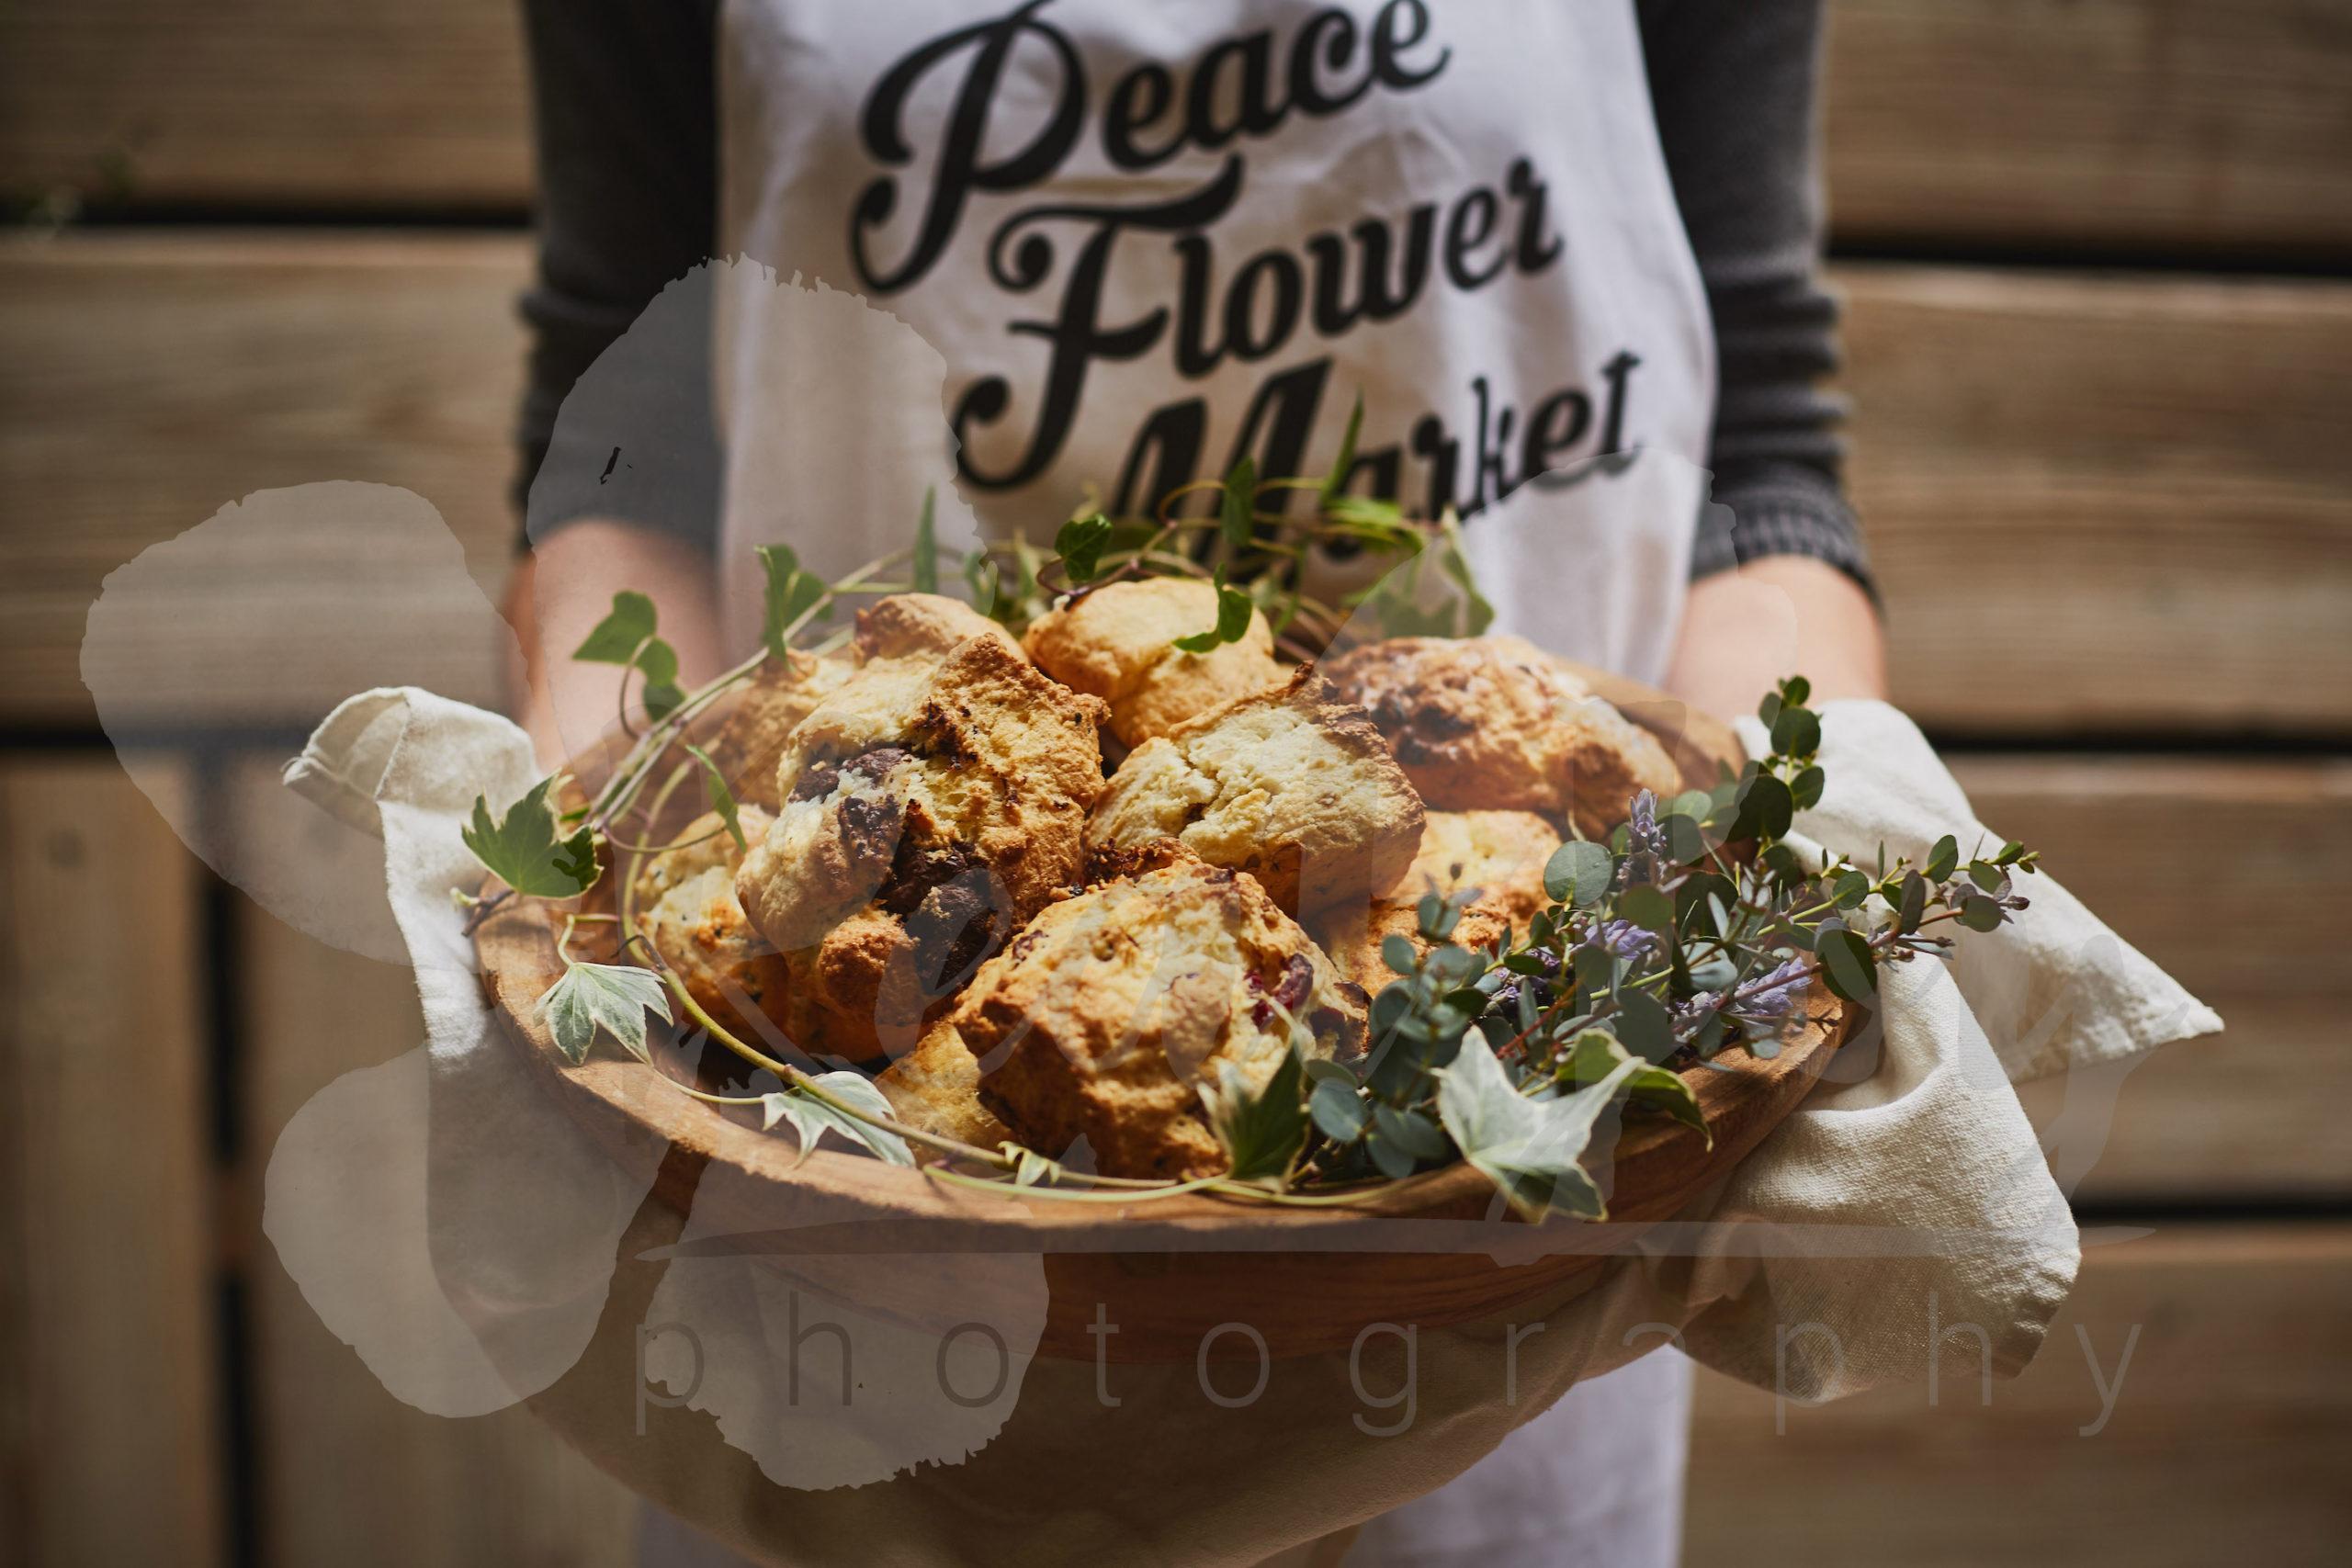 Peace Flower Market & Cafe